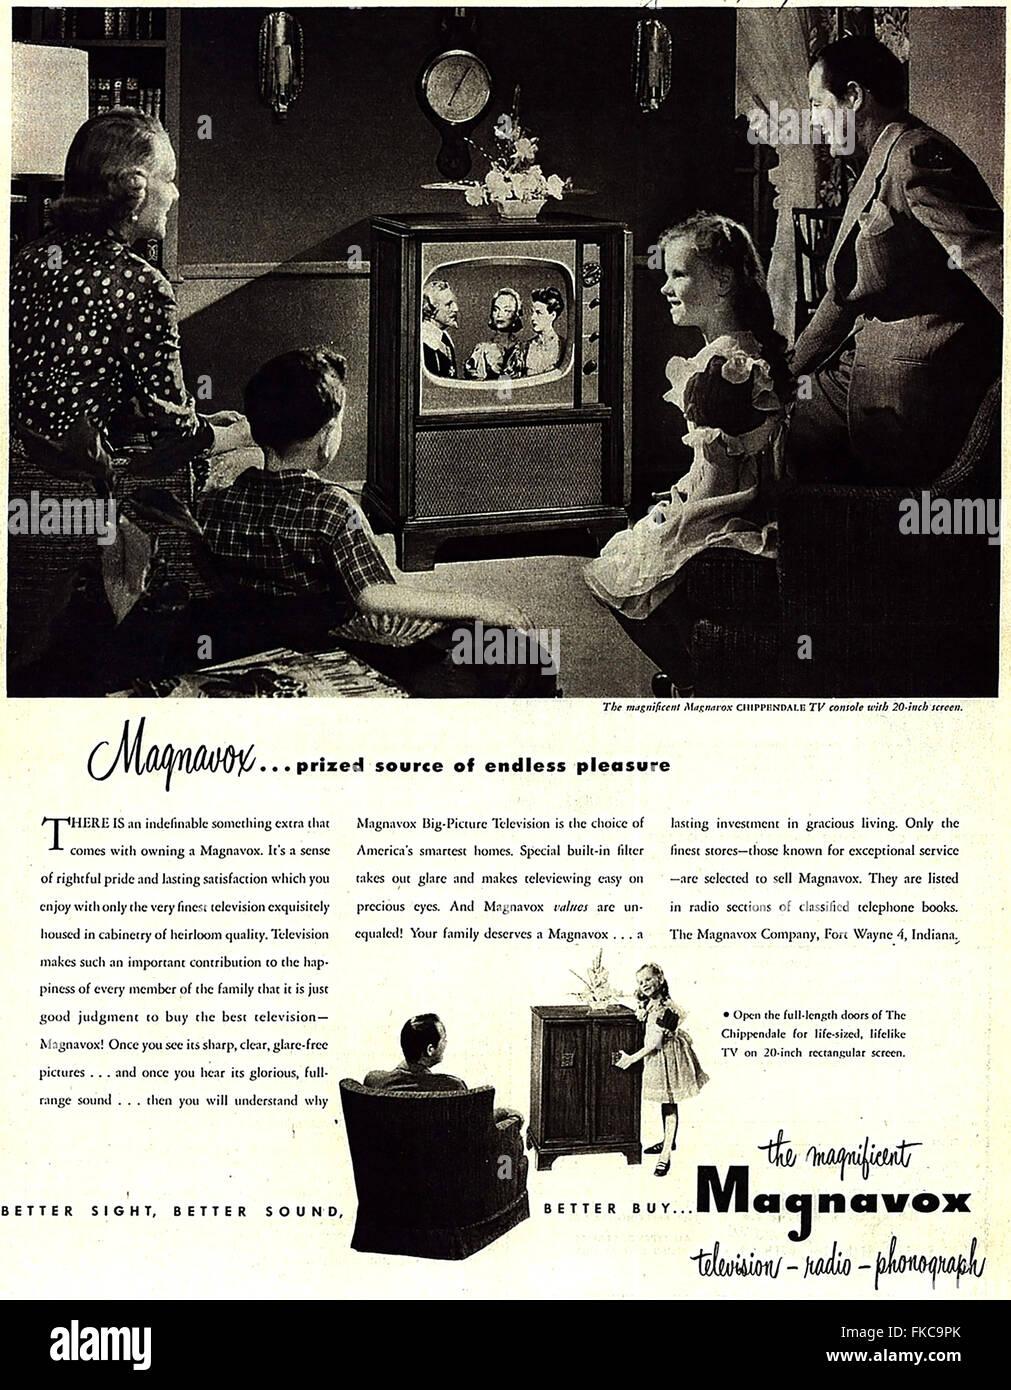 USA Magnavox Magazine Advert - Stock Image